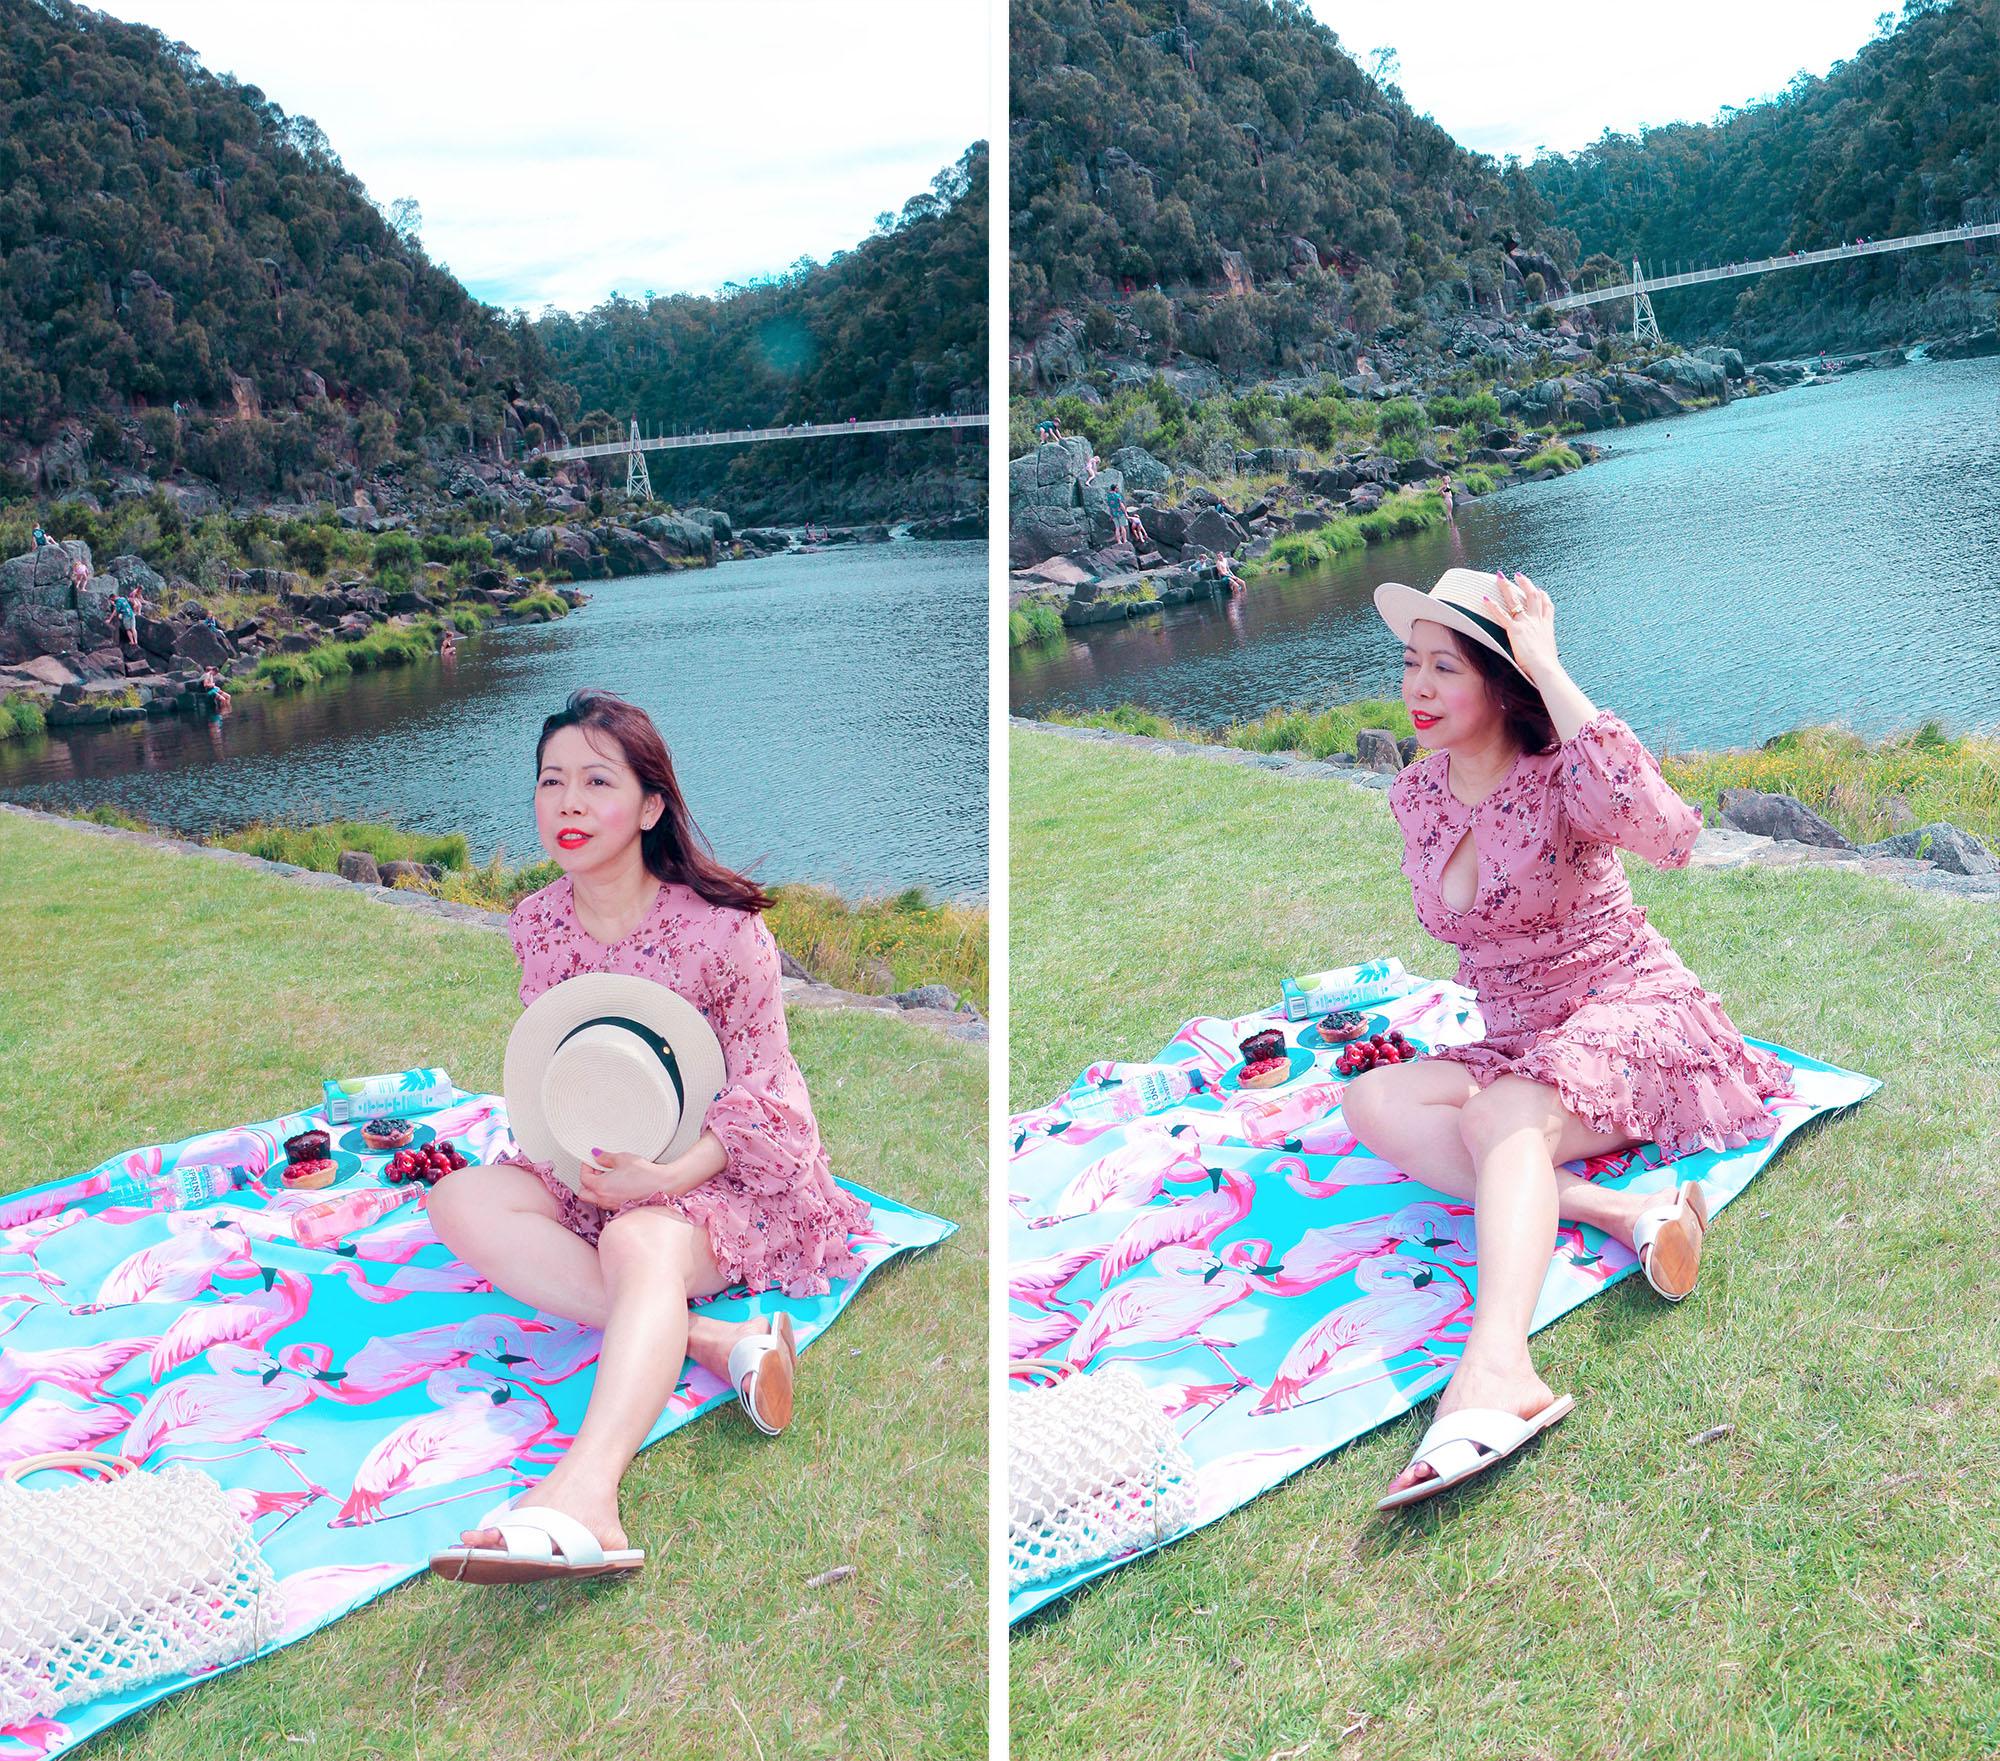 Cataract Gorge picnic